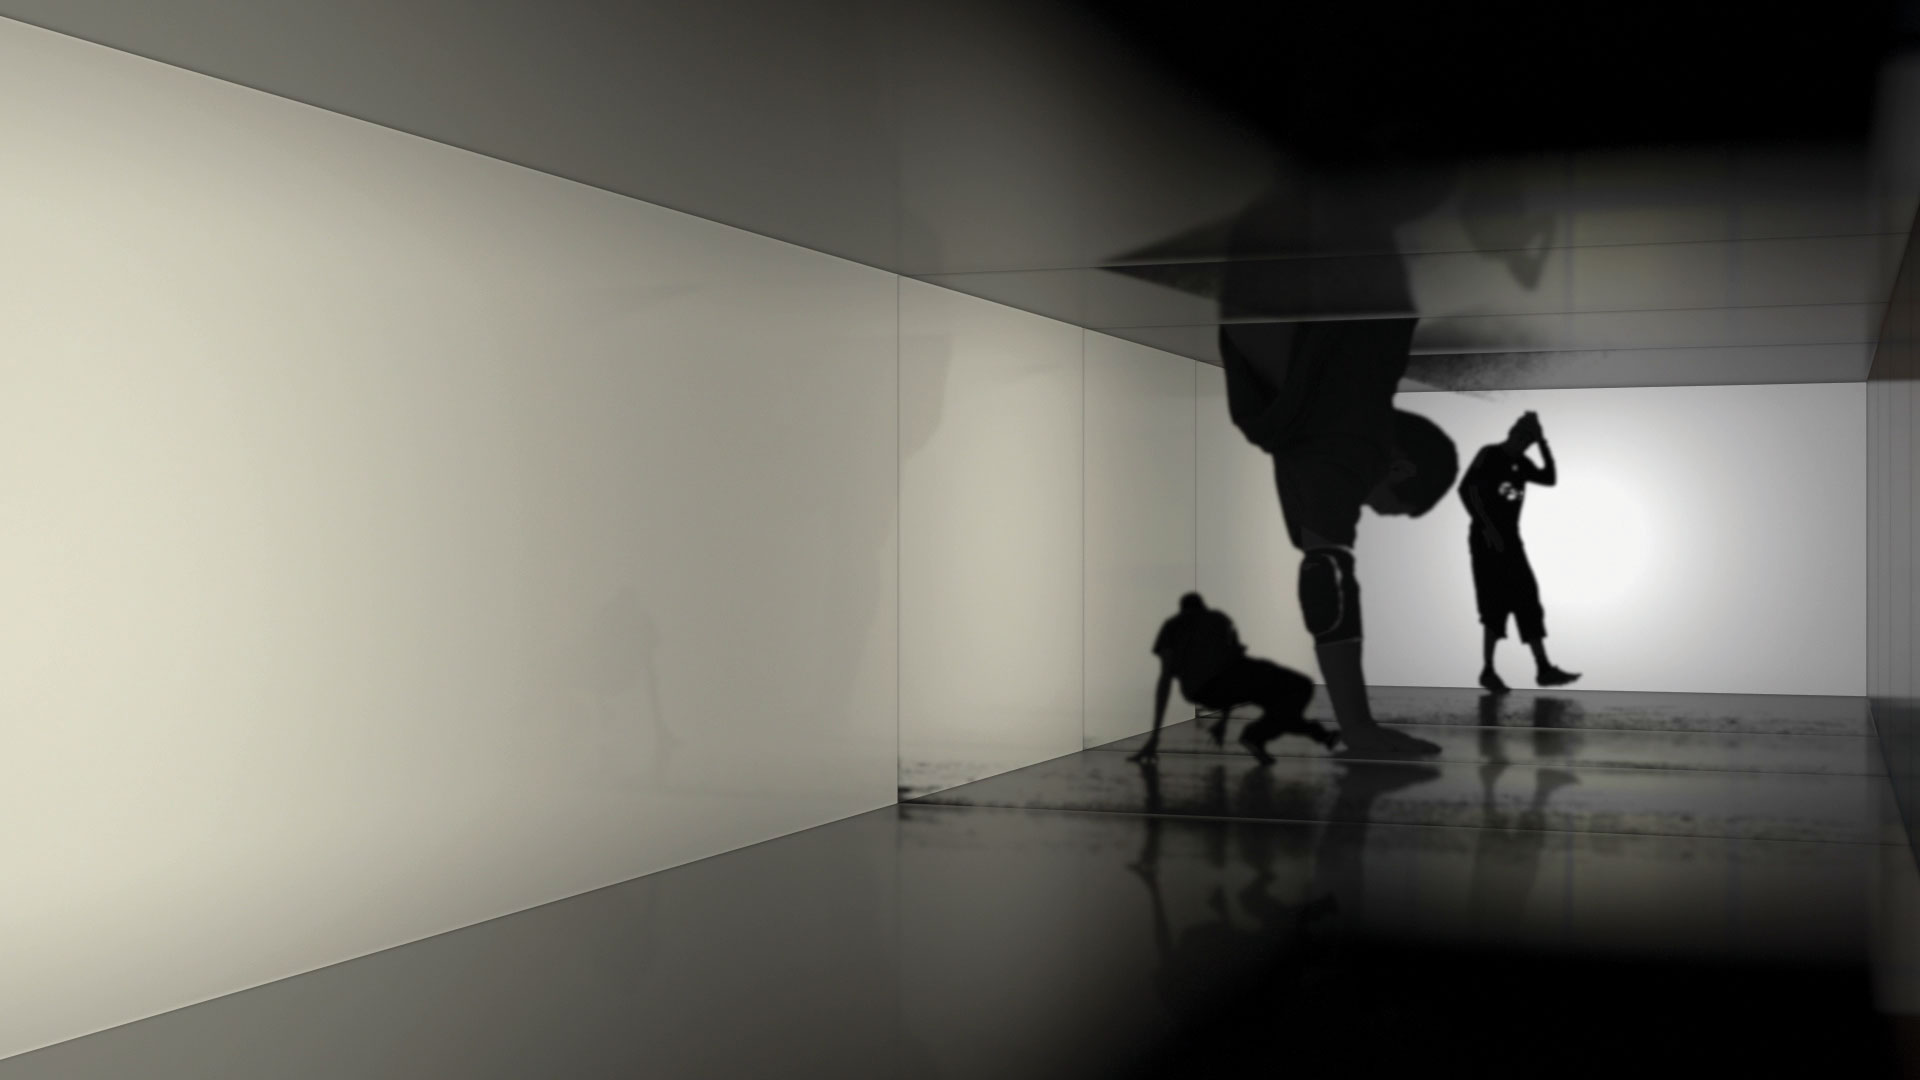 Square My Feet (2012)